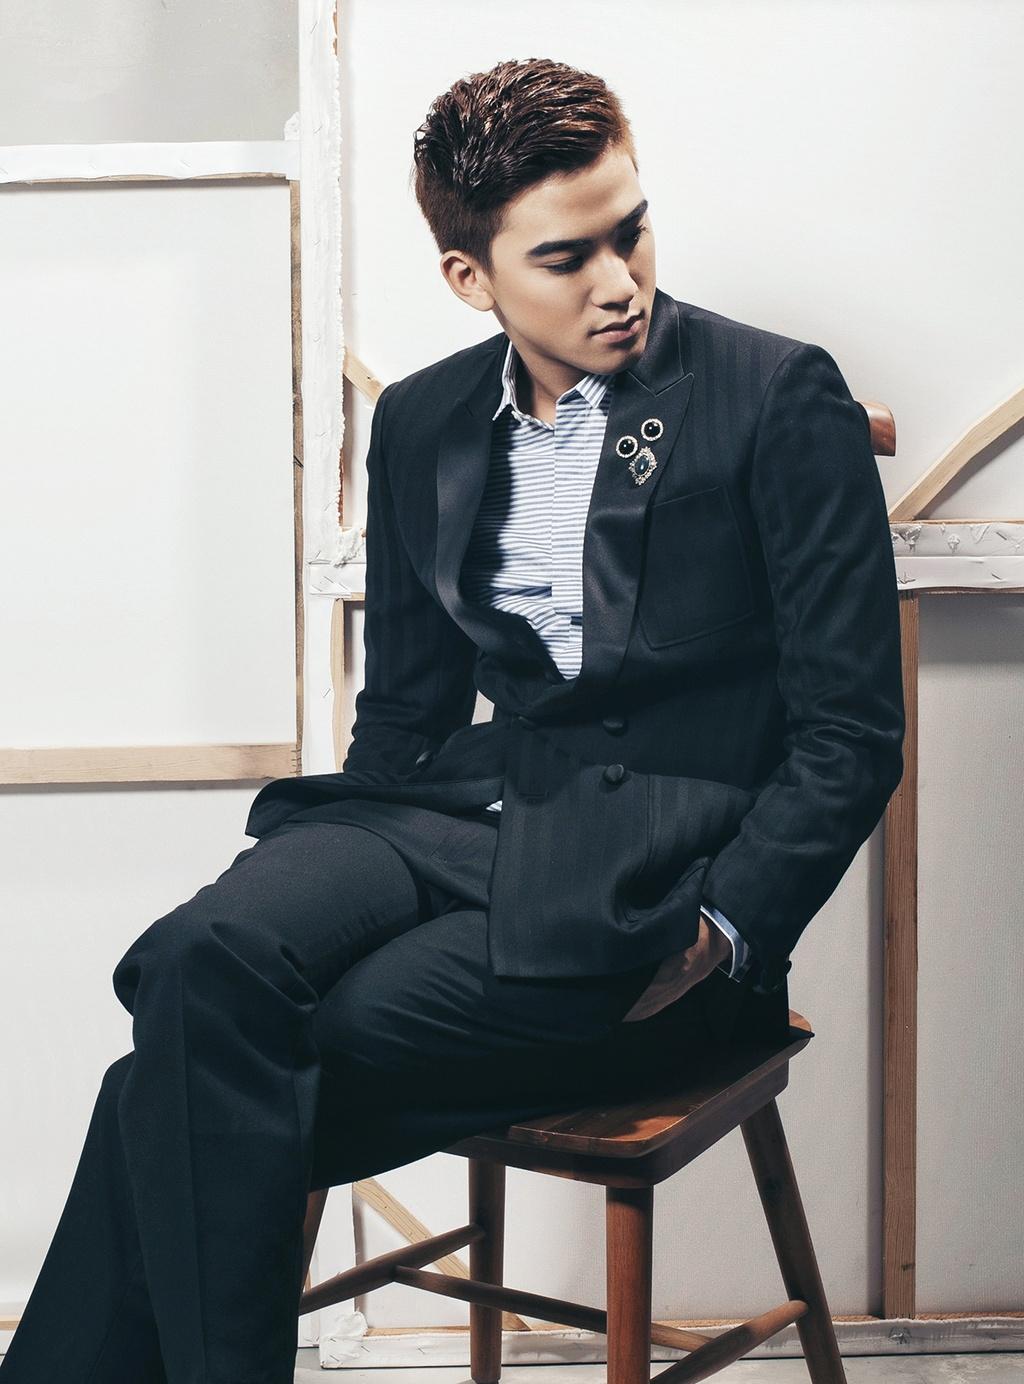 Hot boy 'Thang nam ruc ro': Chi co the noi chuyen voi Jun Vu hinh anh 5